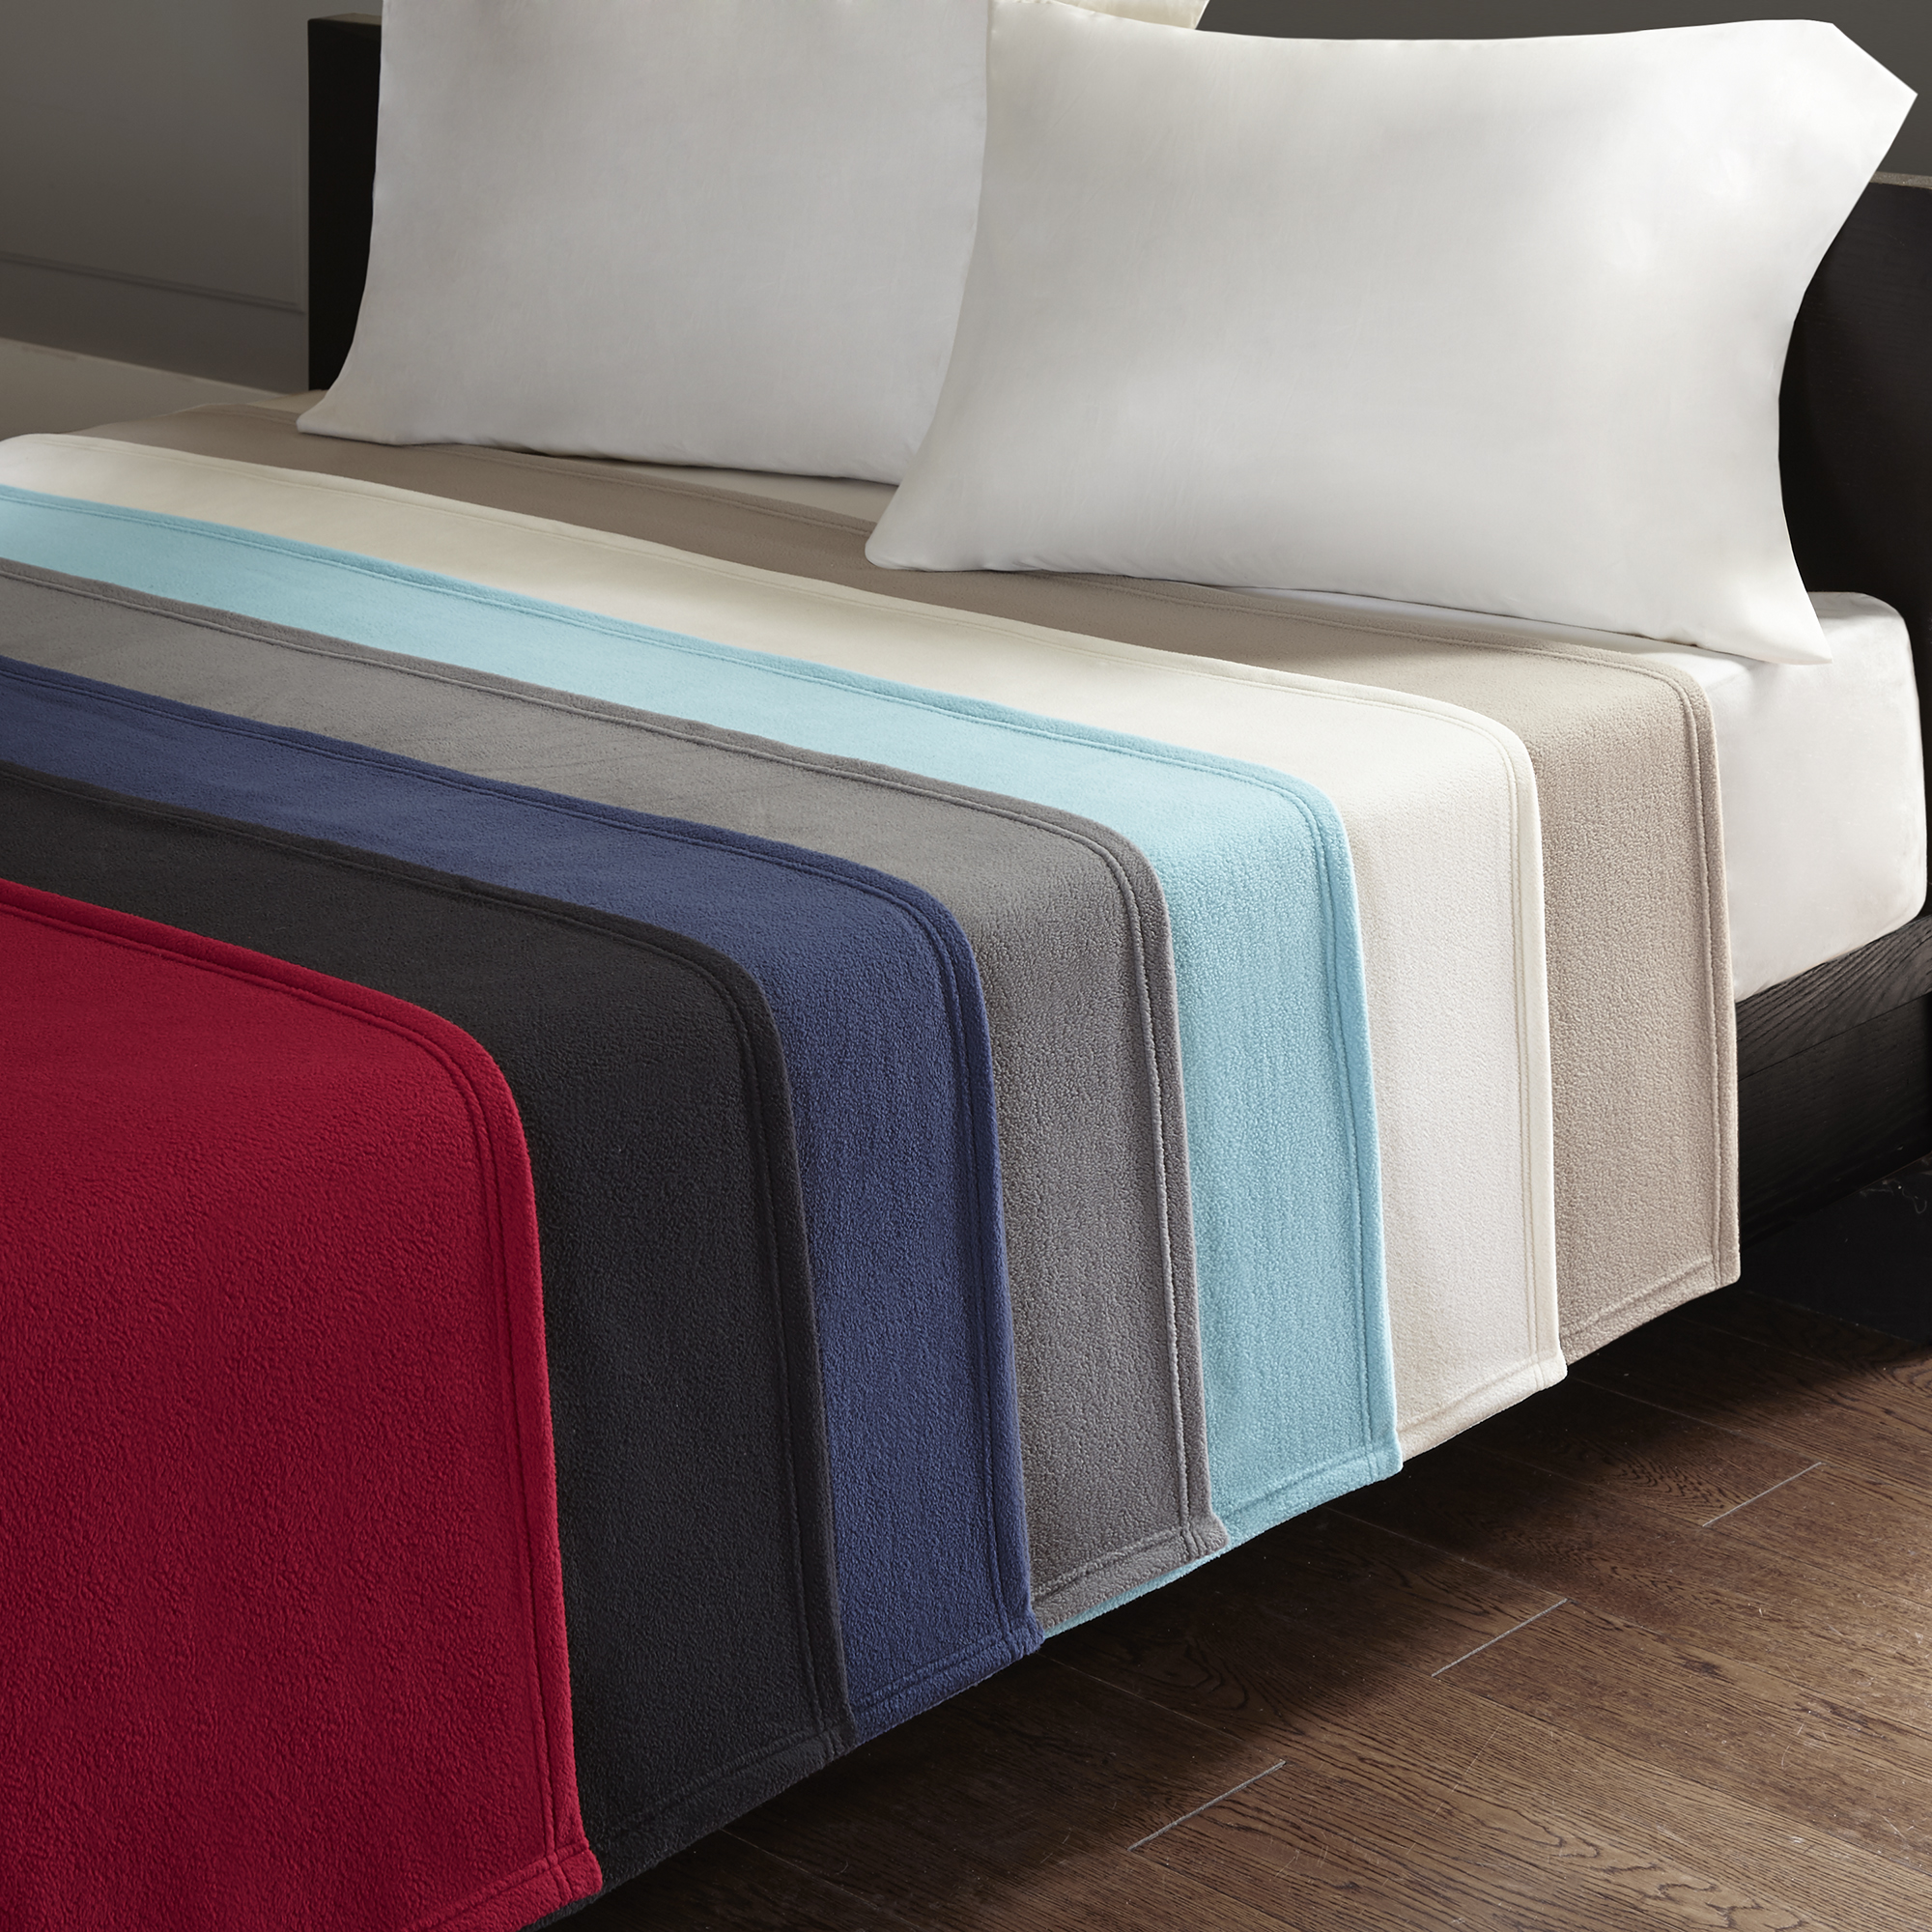 Comfort Classics Peak Performance 3M Scotchgard Micro Fleece Blanket